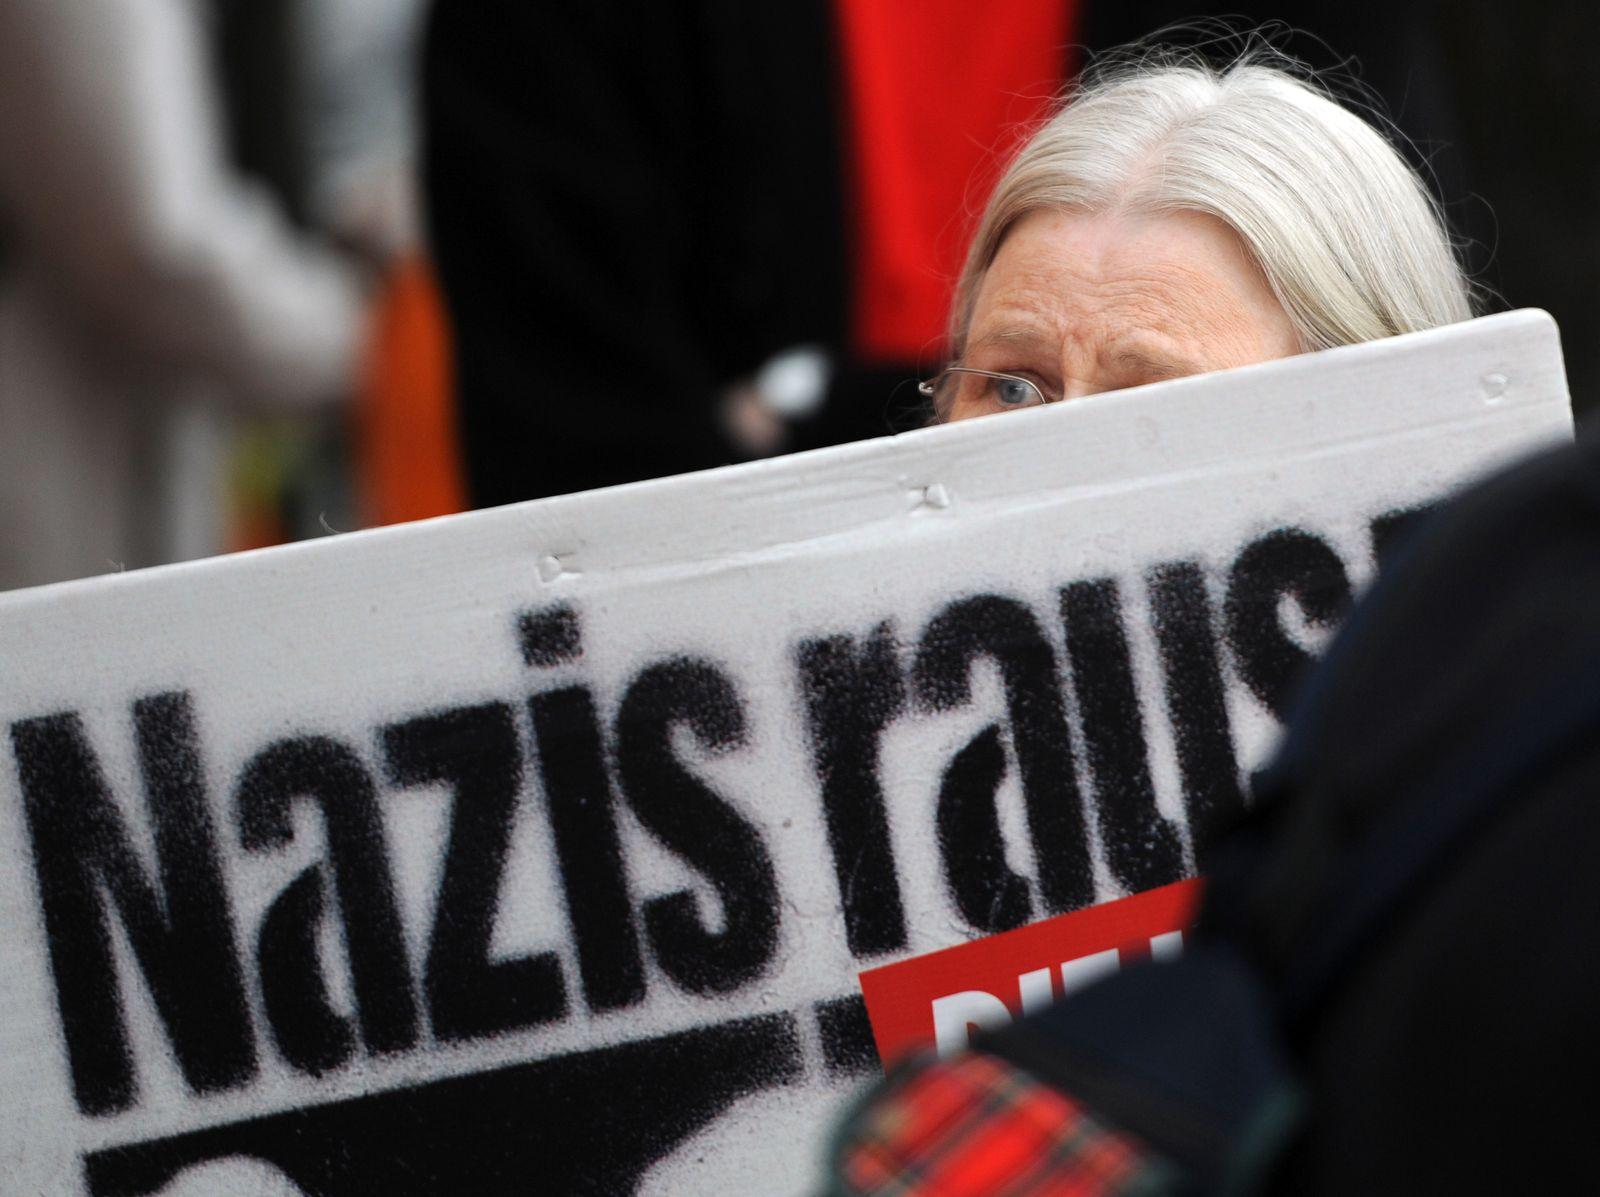 NPD / Kundgebung / Nazis raus